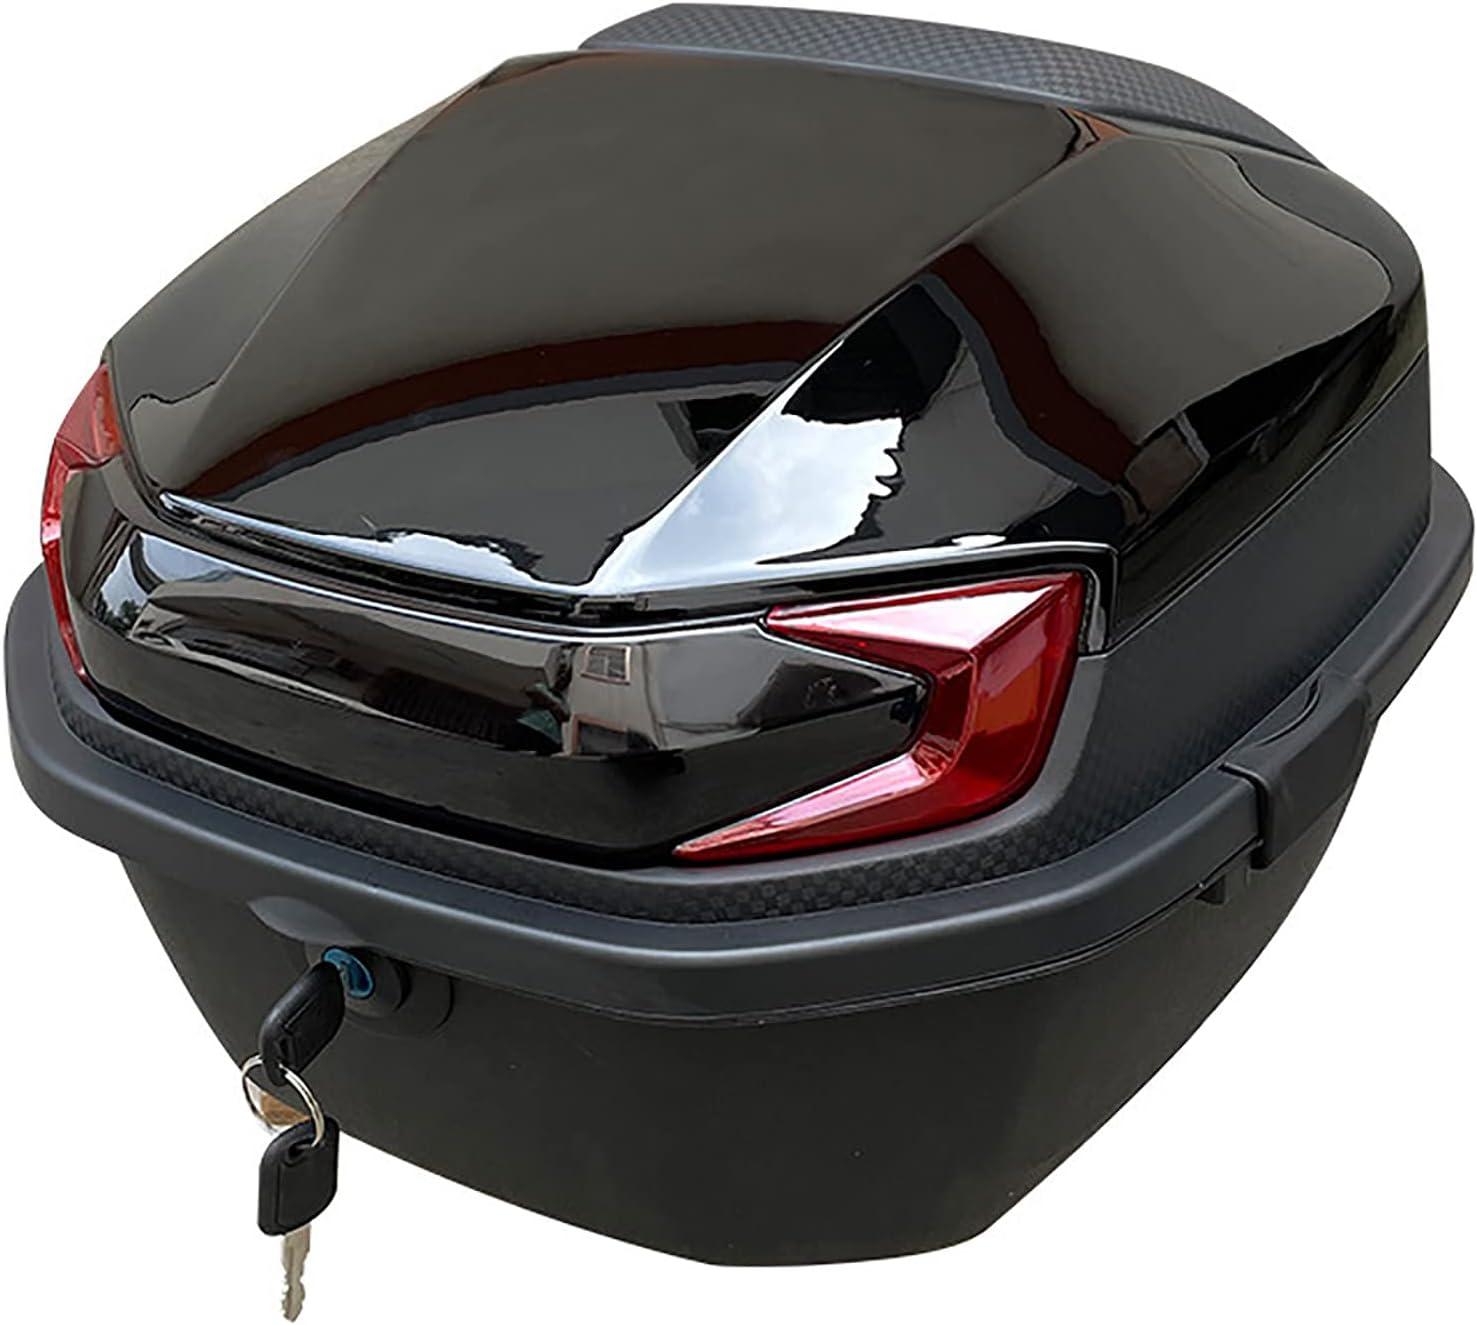 WANGPP Universal Motorcycle Top Storage Max 74% OFF Max 43% OFF Case Luggage Helmet